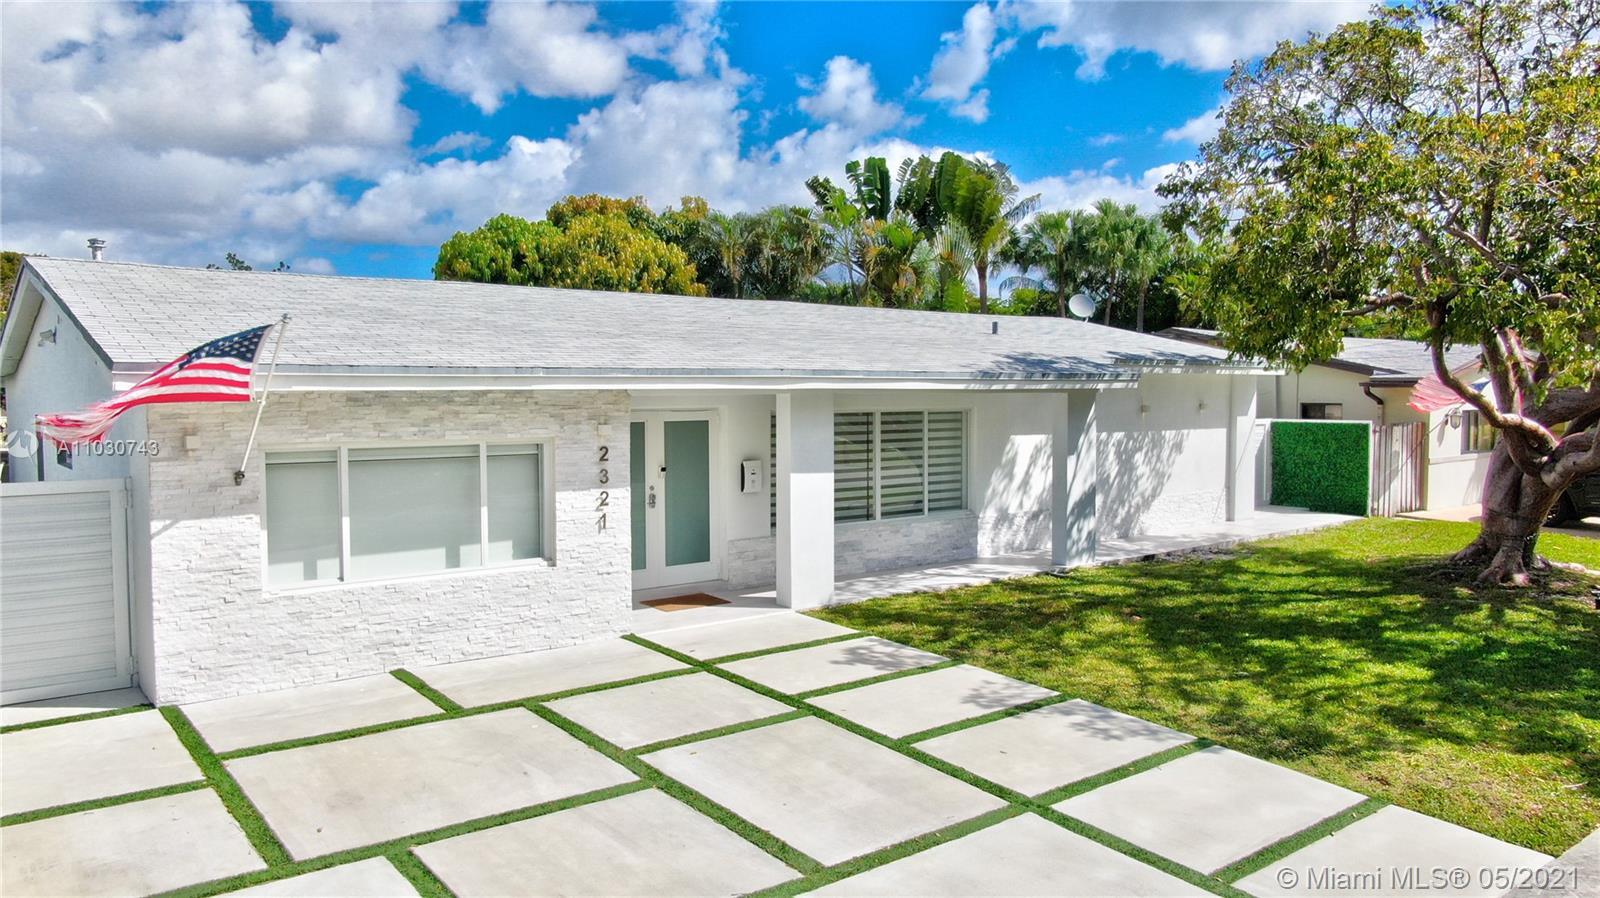 Enchanted Lake - 2321 NE 192nd St, Miami, FL 33180